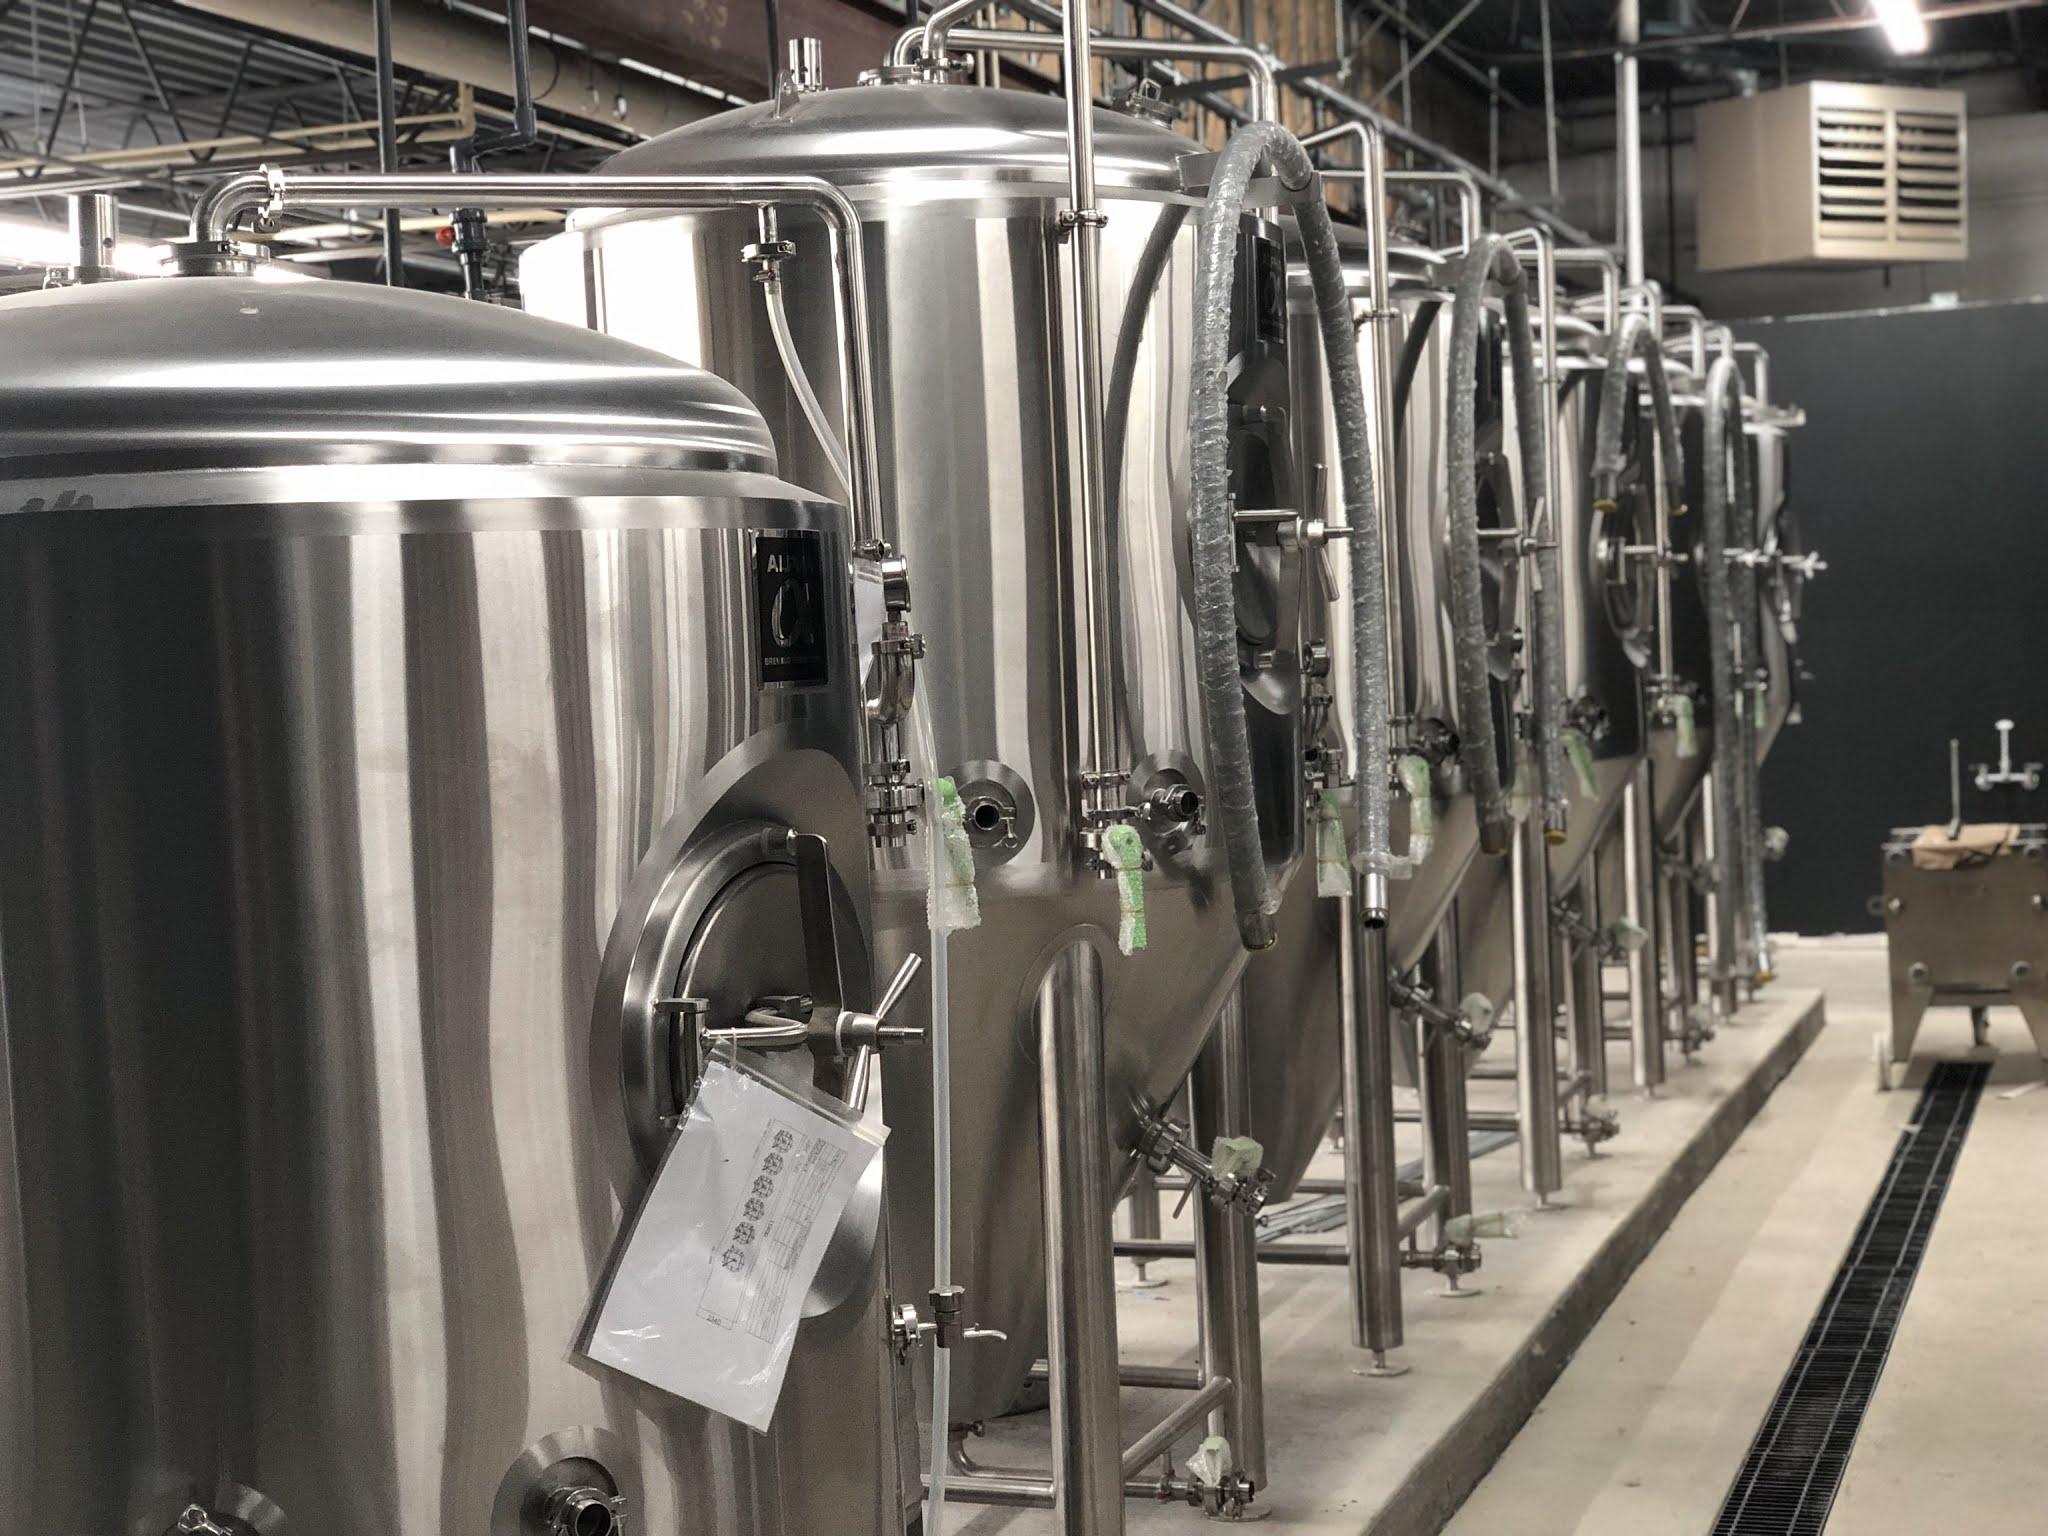 Olentangy_River_Brewing_Fermentors.jpg